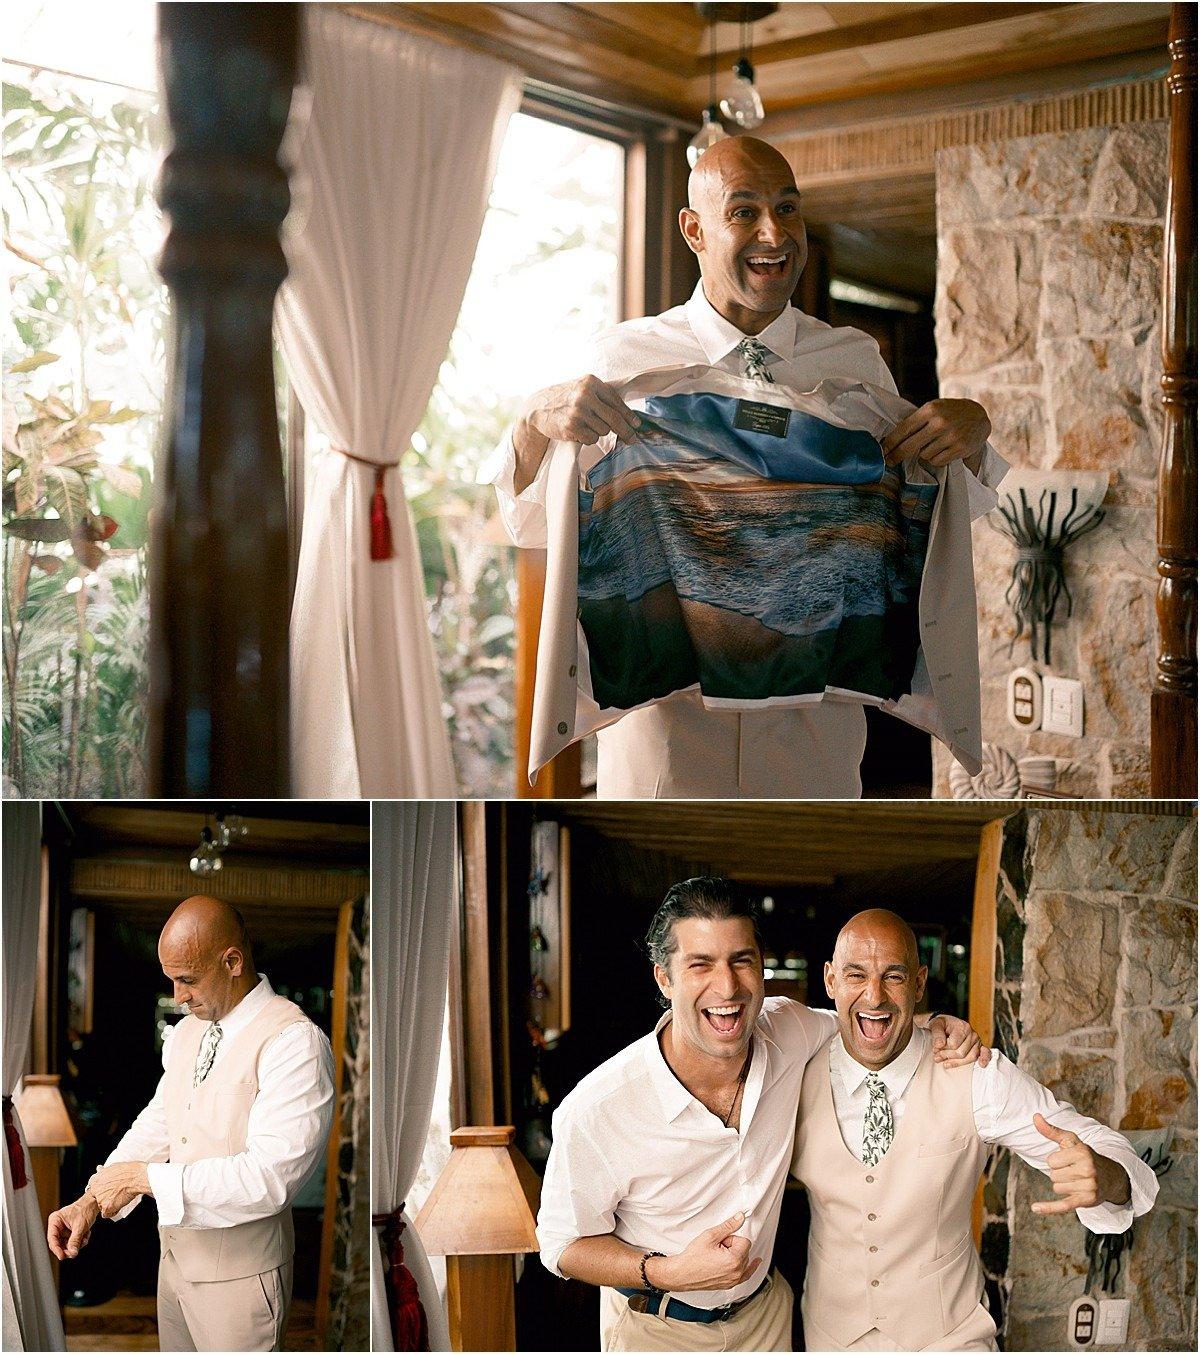 groom-with-custom-wedding-vest